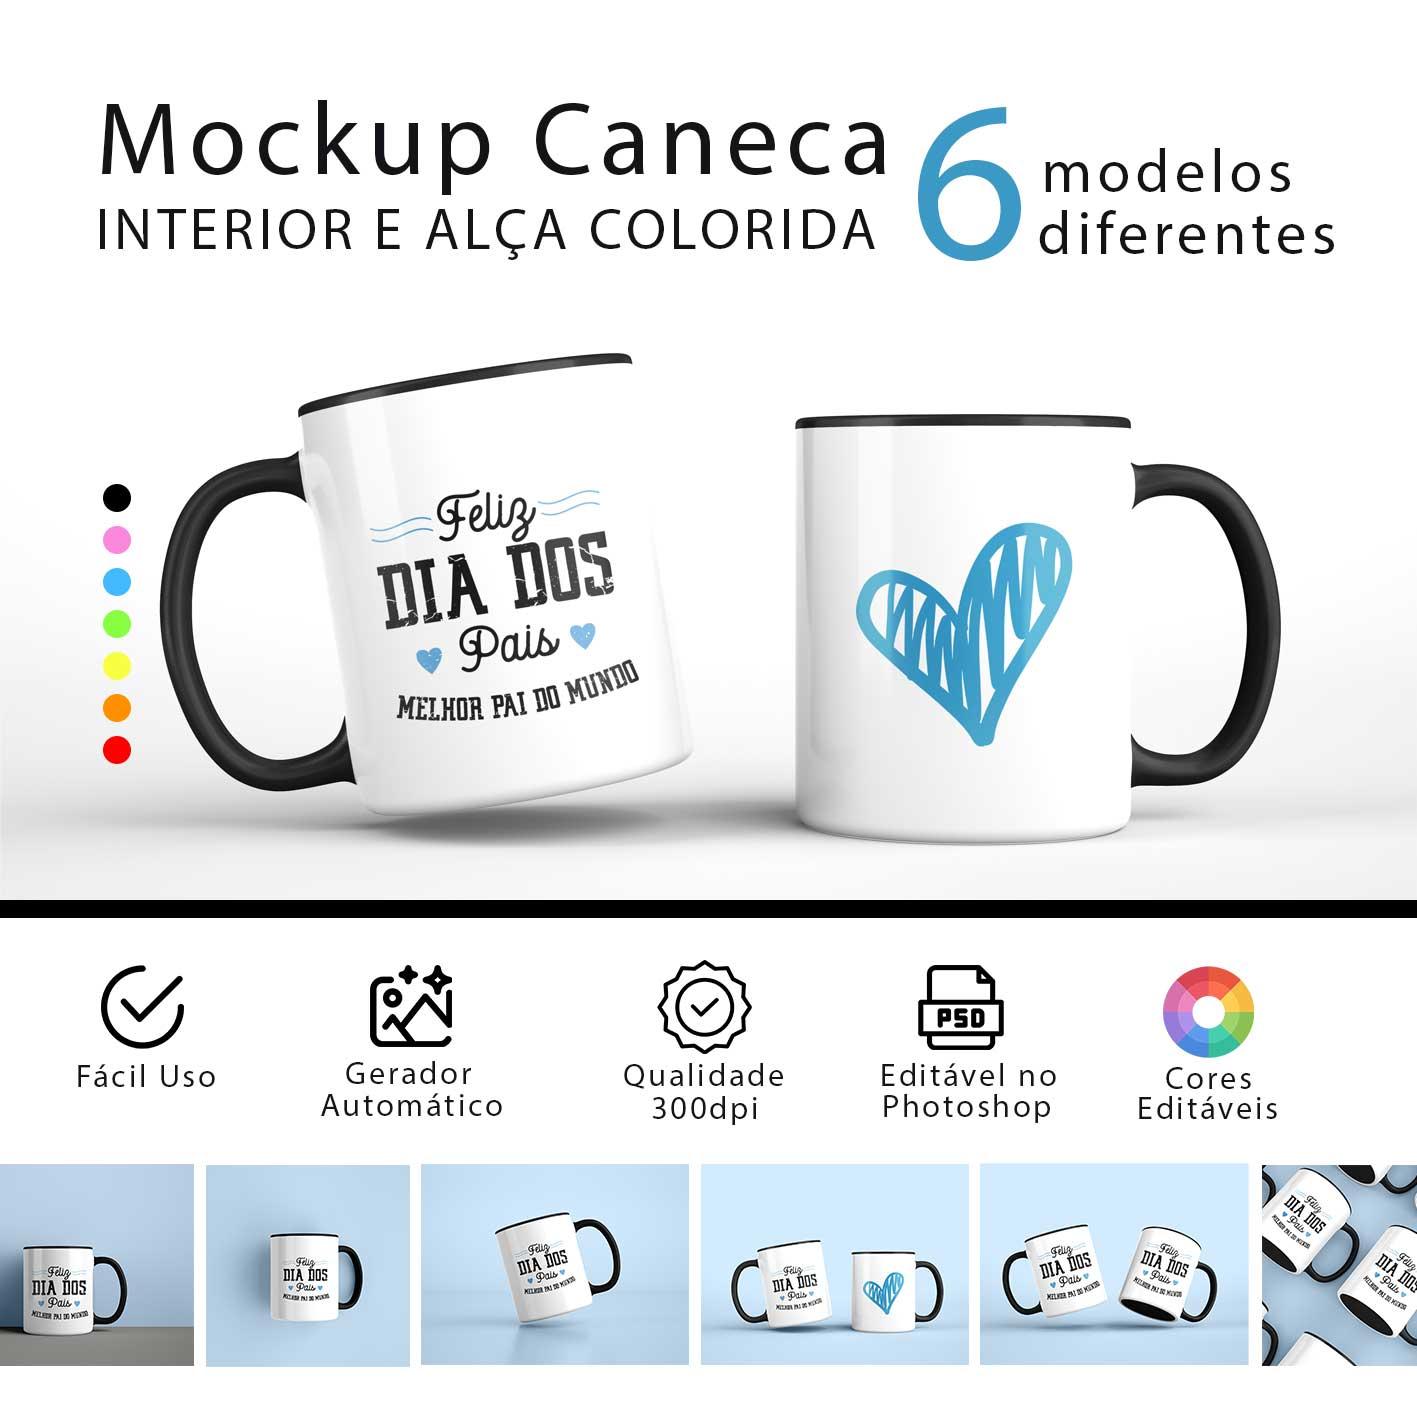 Mockups para Caneca Colorida - 6 Modelos